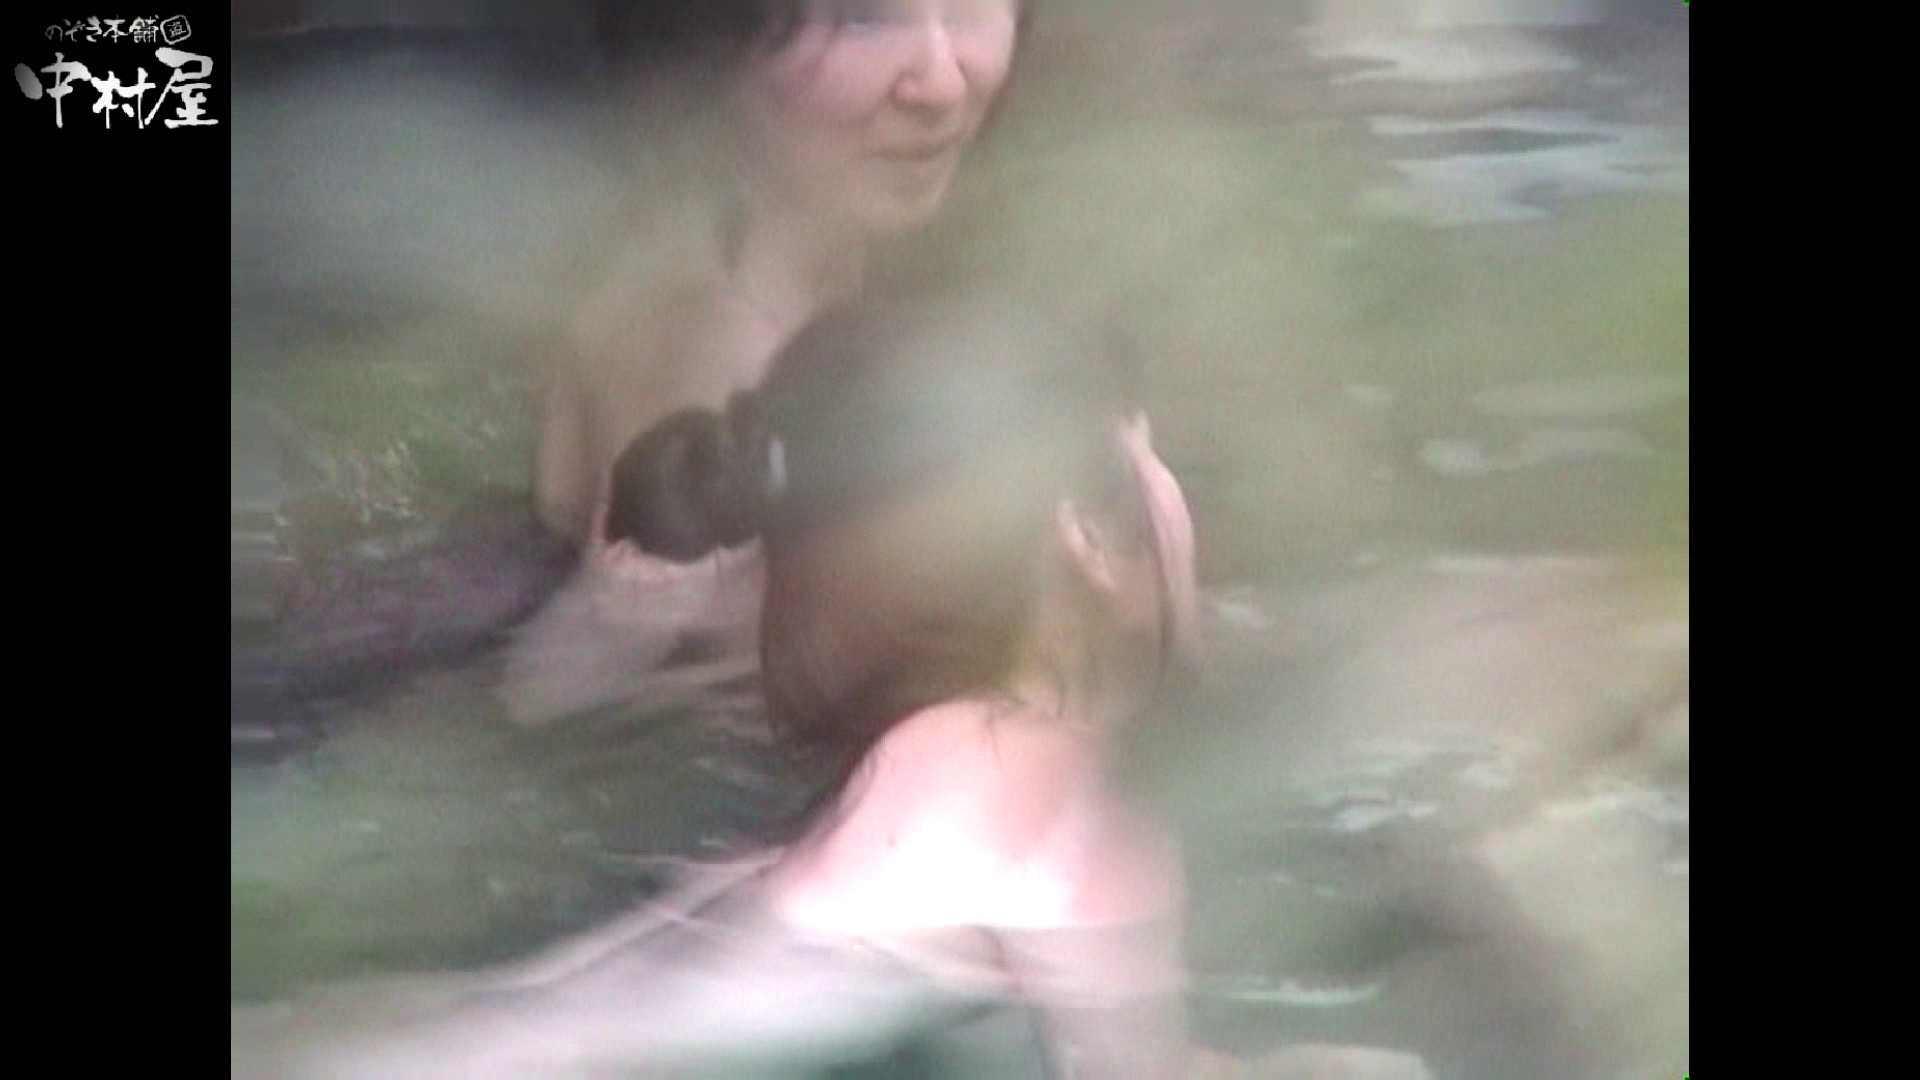 Aquaな露天風呂Vol.953 OLのエロ生活   露天風呂  107連発 58